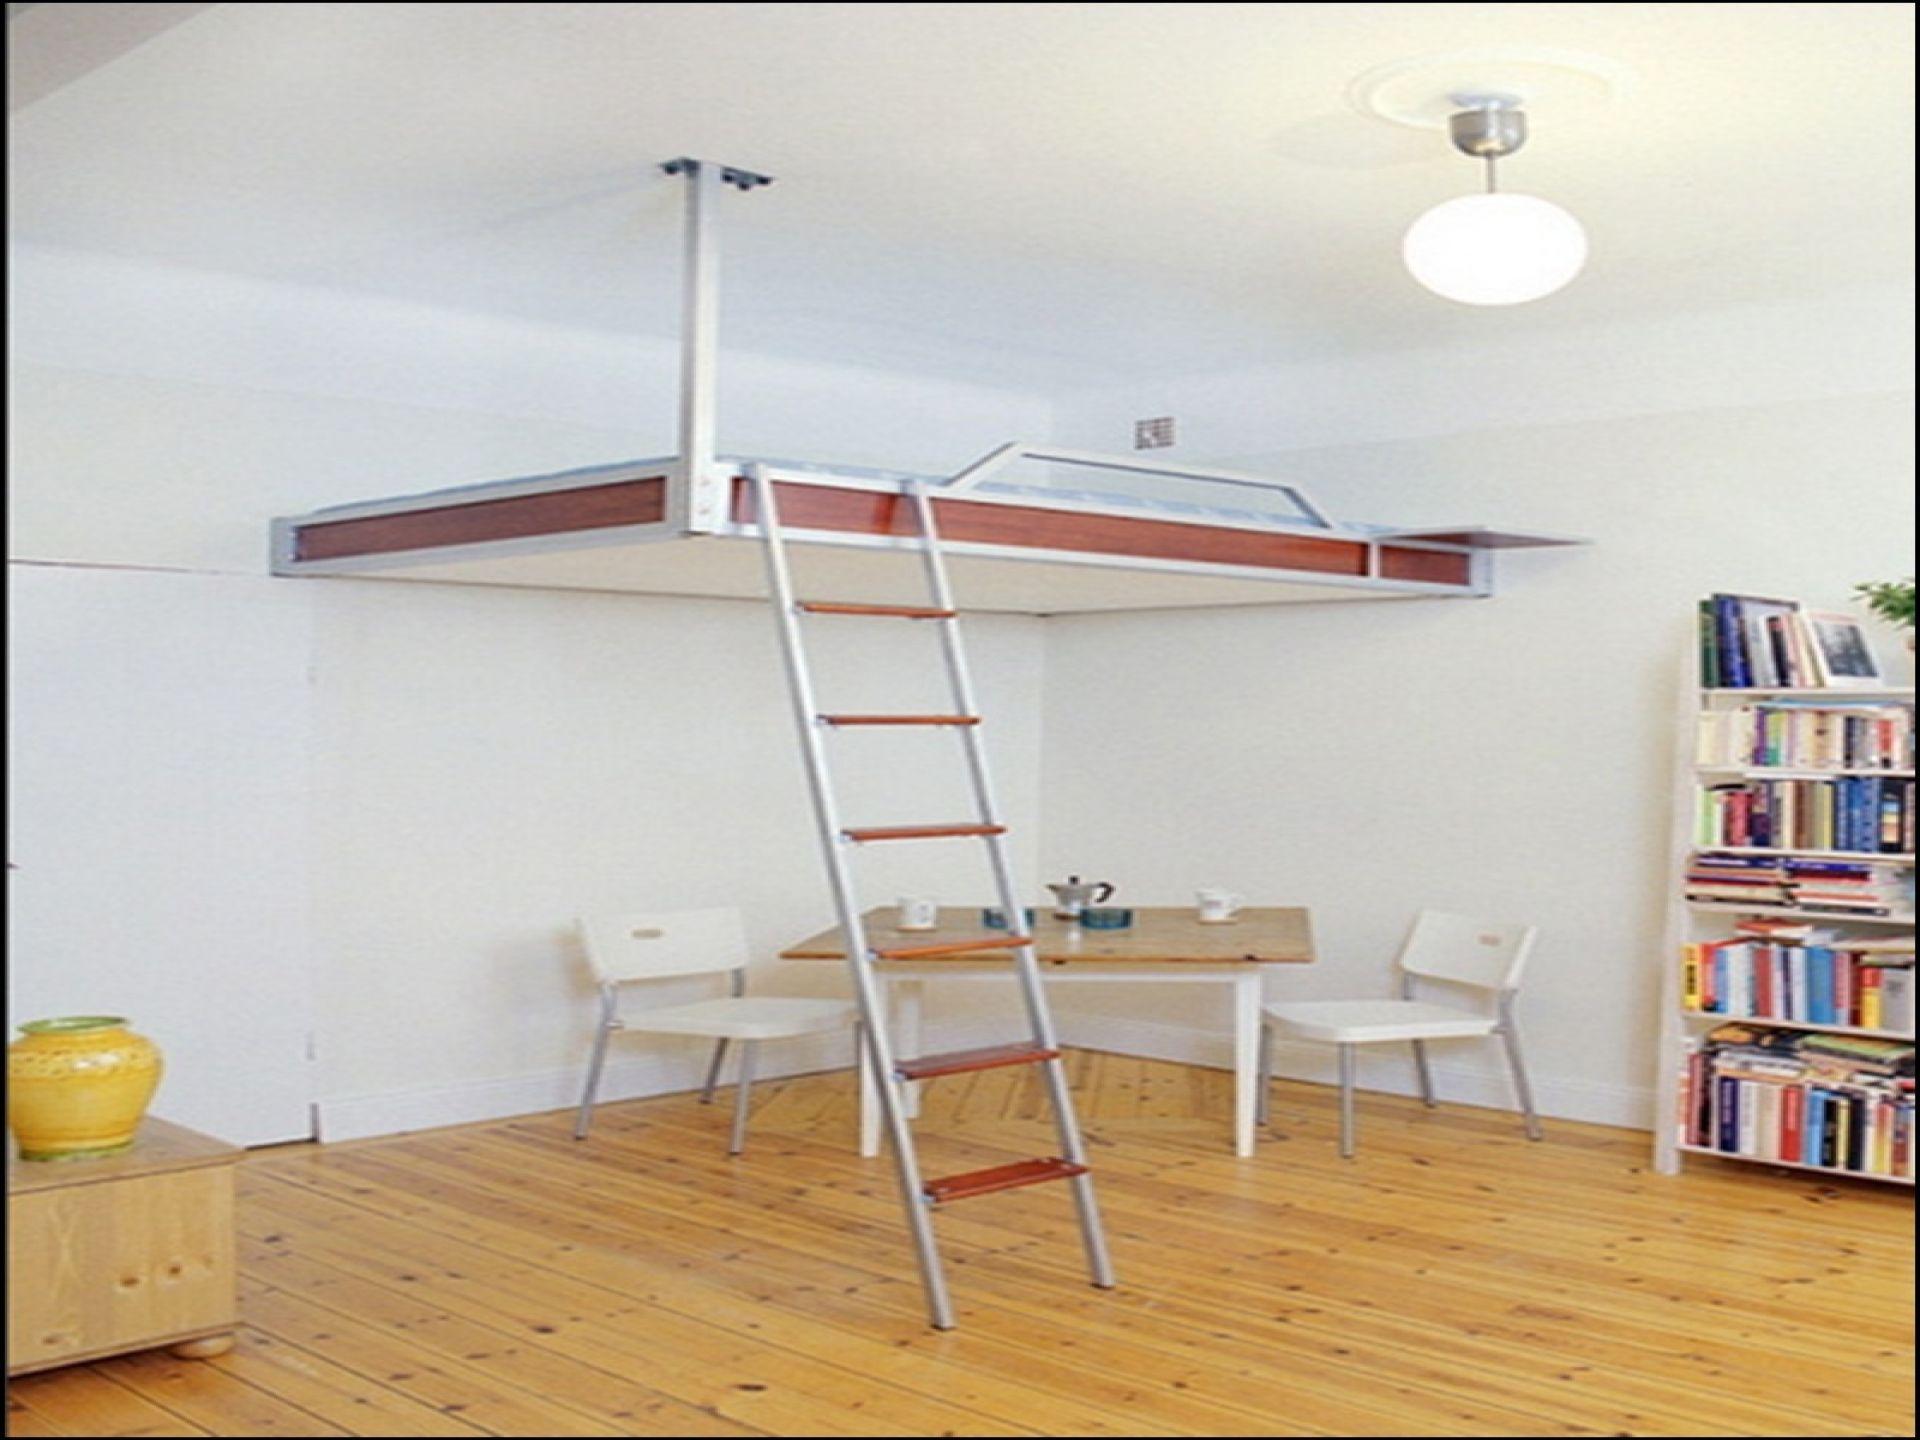 Ceiling Suspended Loft Beds  bunk beds  Pinterest  Ceiling Lofts